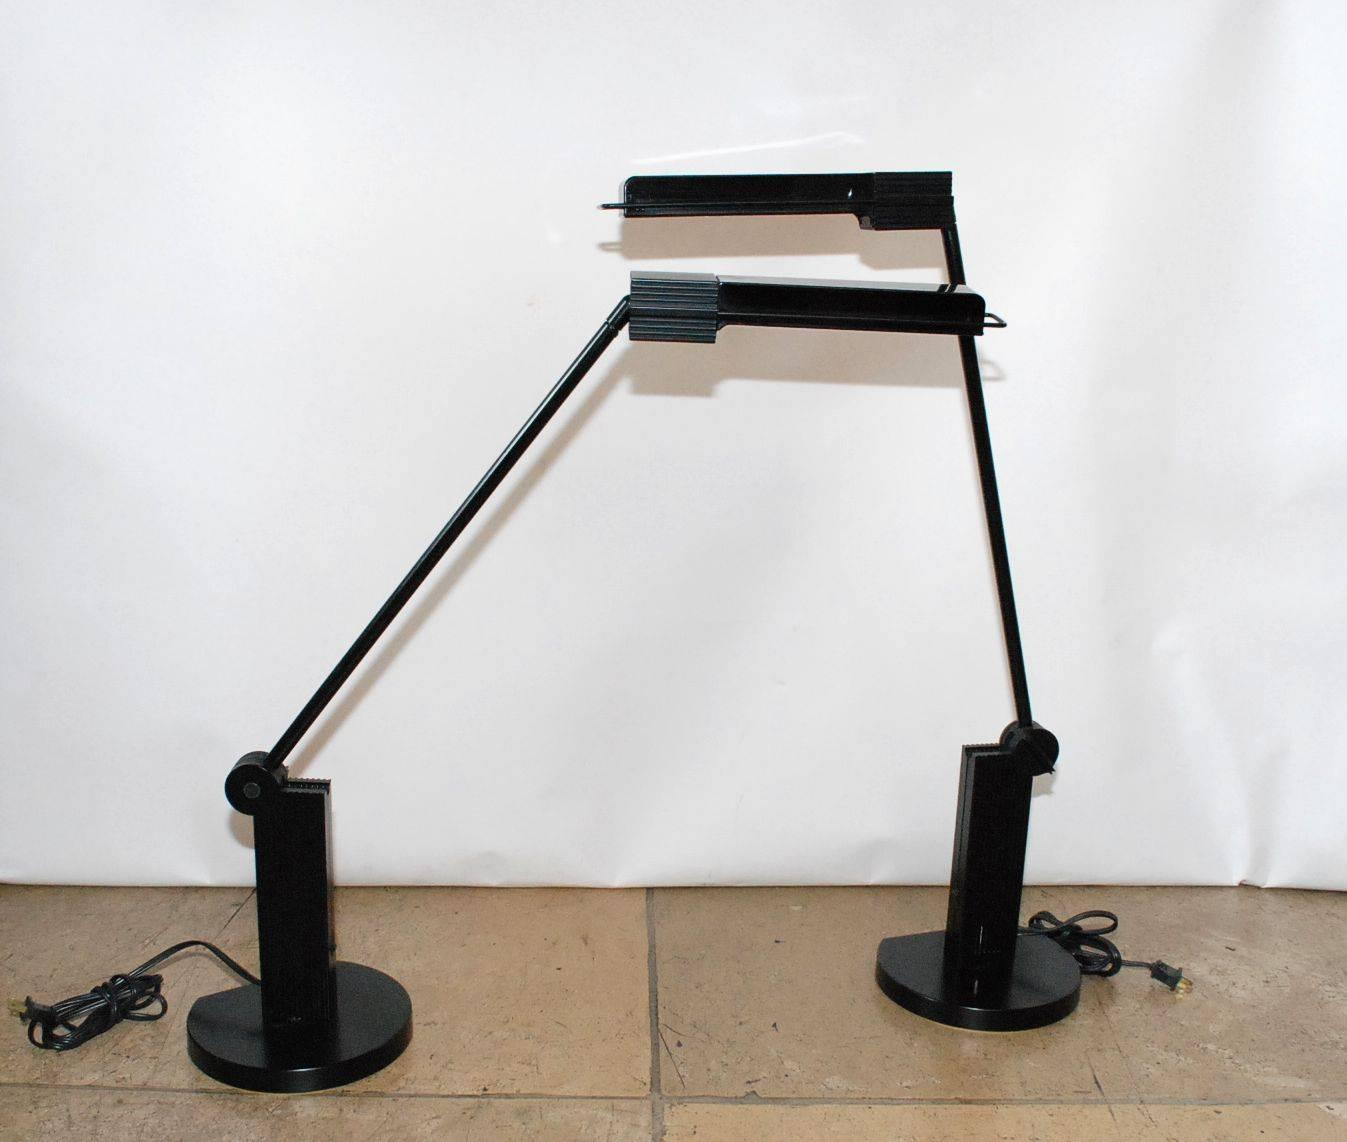 pair of artemide alistro table lamps by ernesto gismondi